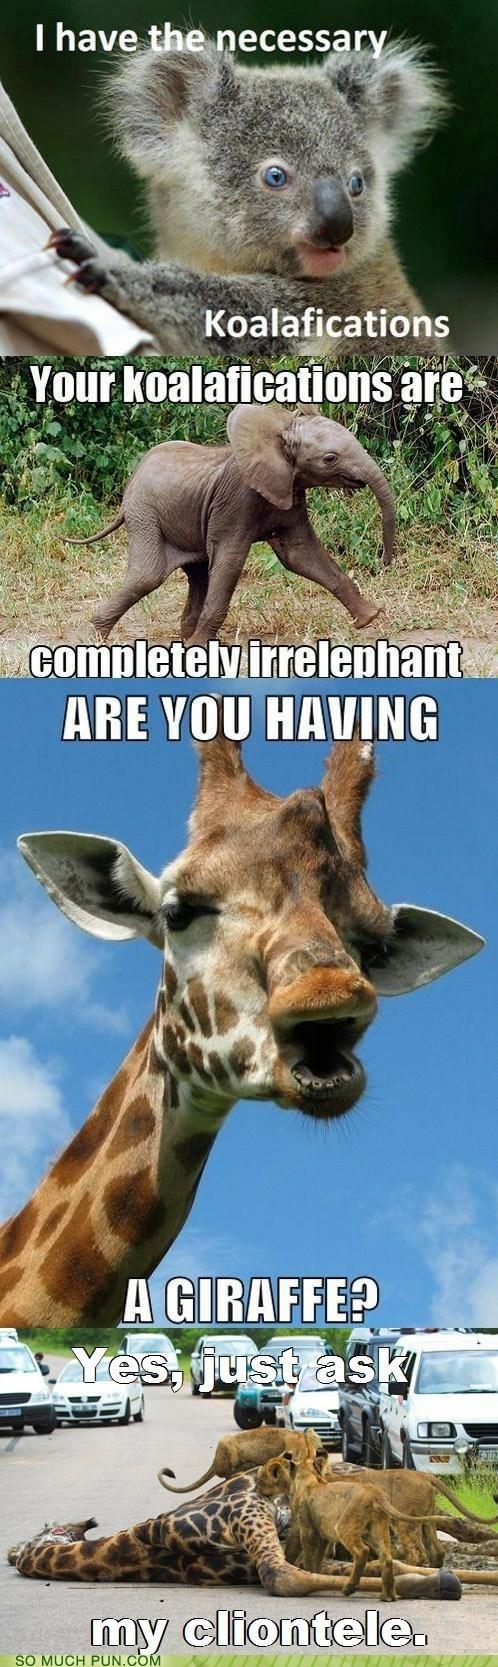 conversation,elephant,giraffes,homophones,koala,lion,literalism,similar sounding